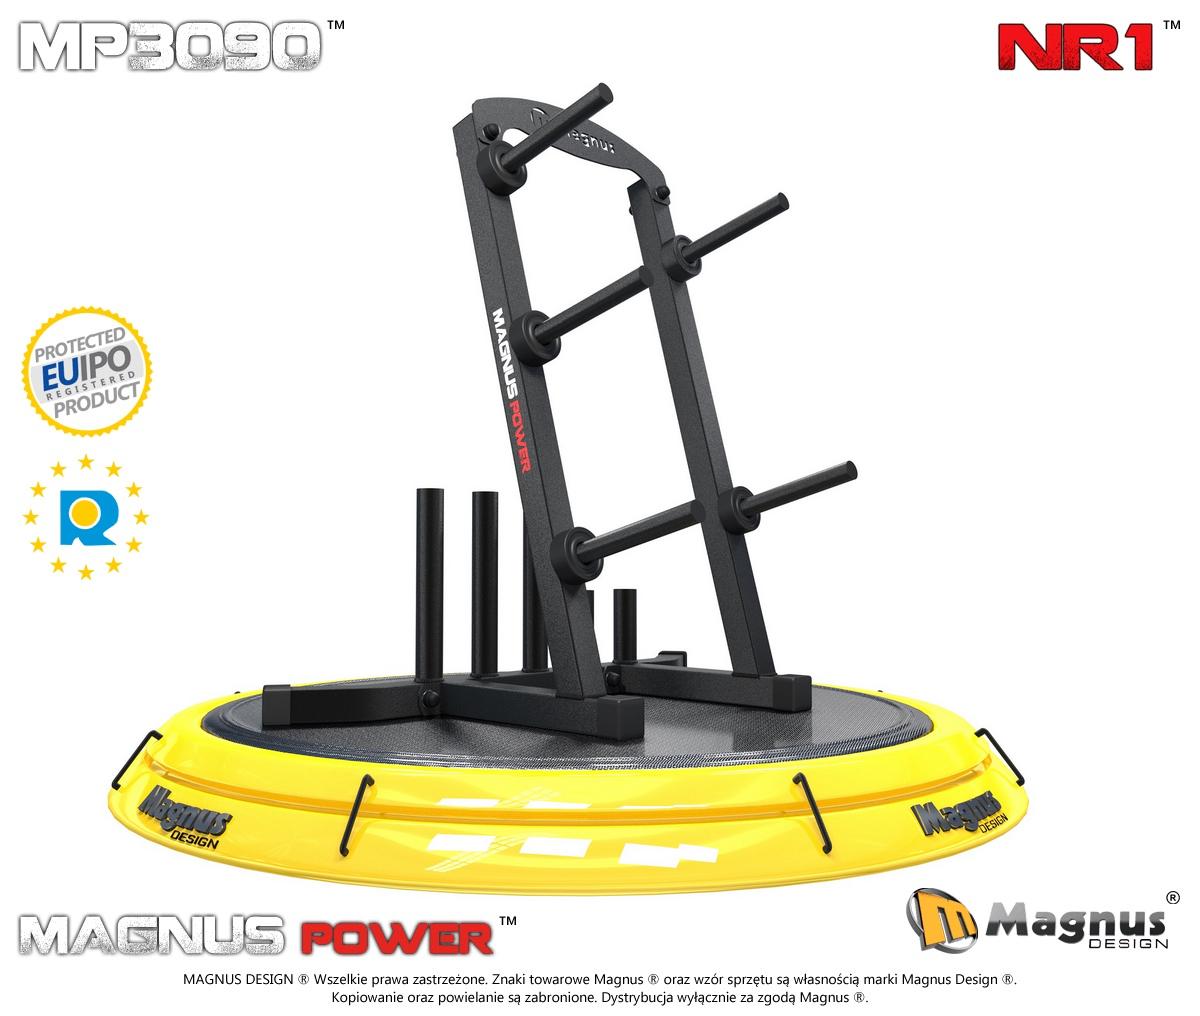 Stojaki treningowe na gryfy  Magnus Power MP3090